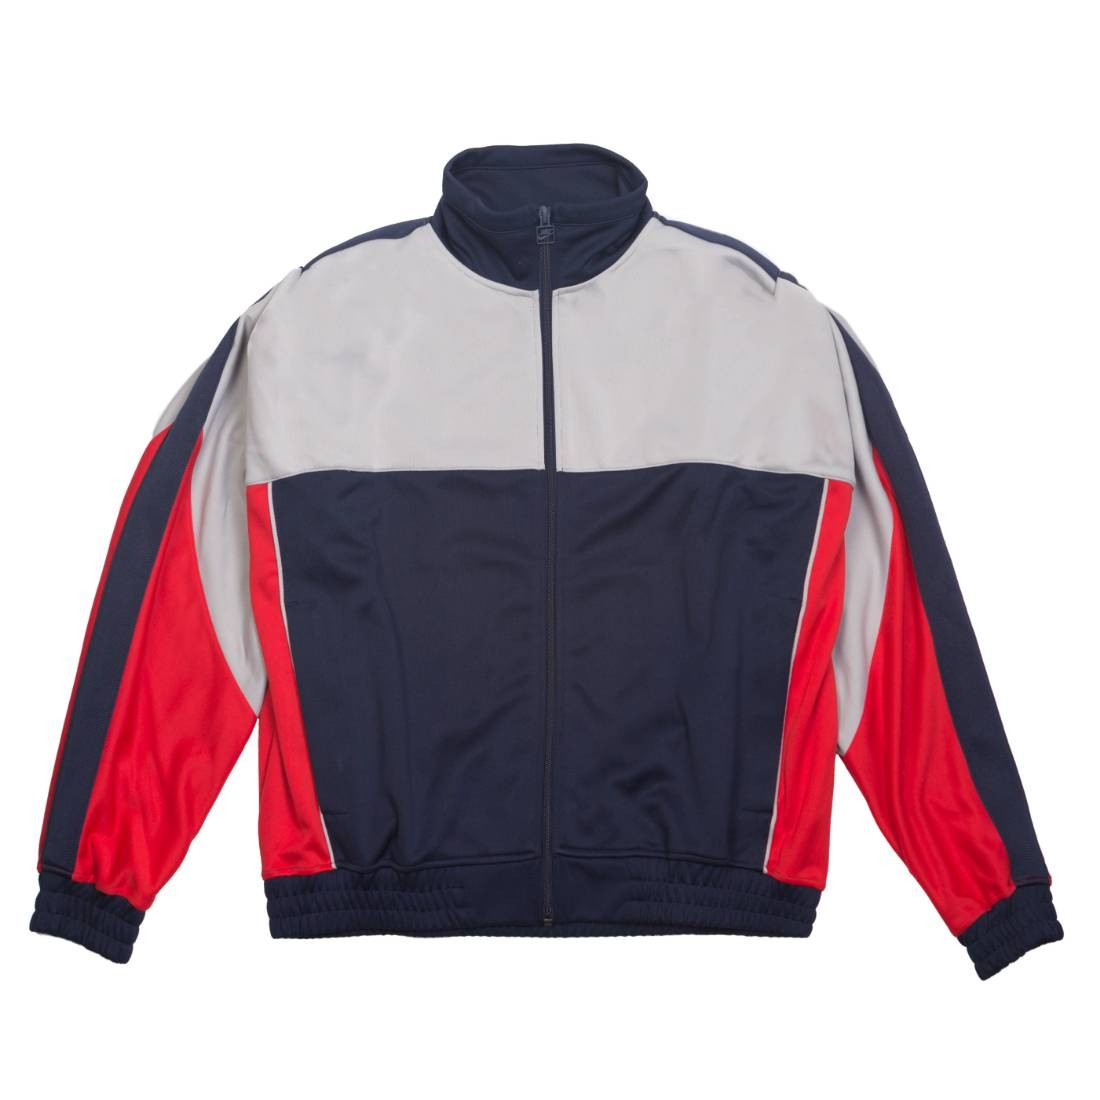 Nike Men M Nrg K Track Jacket (blackened blue / atmosphere grey)